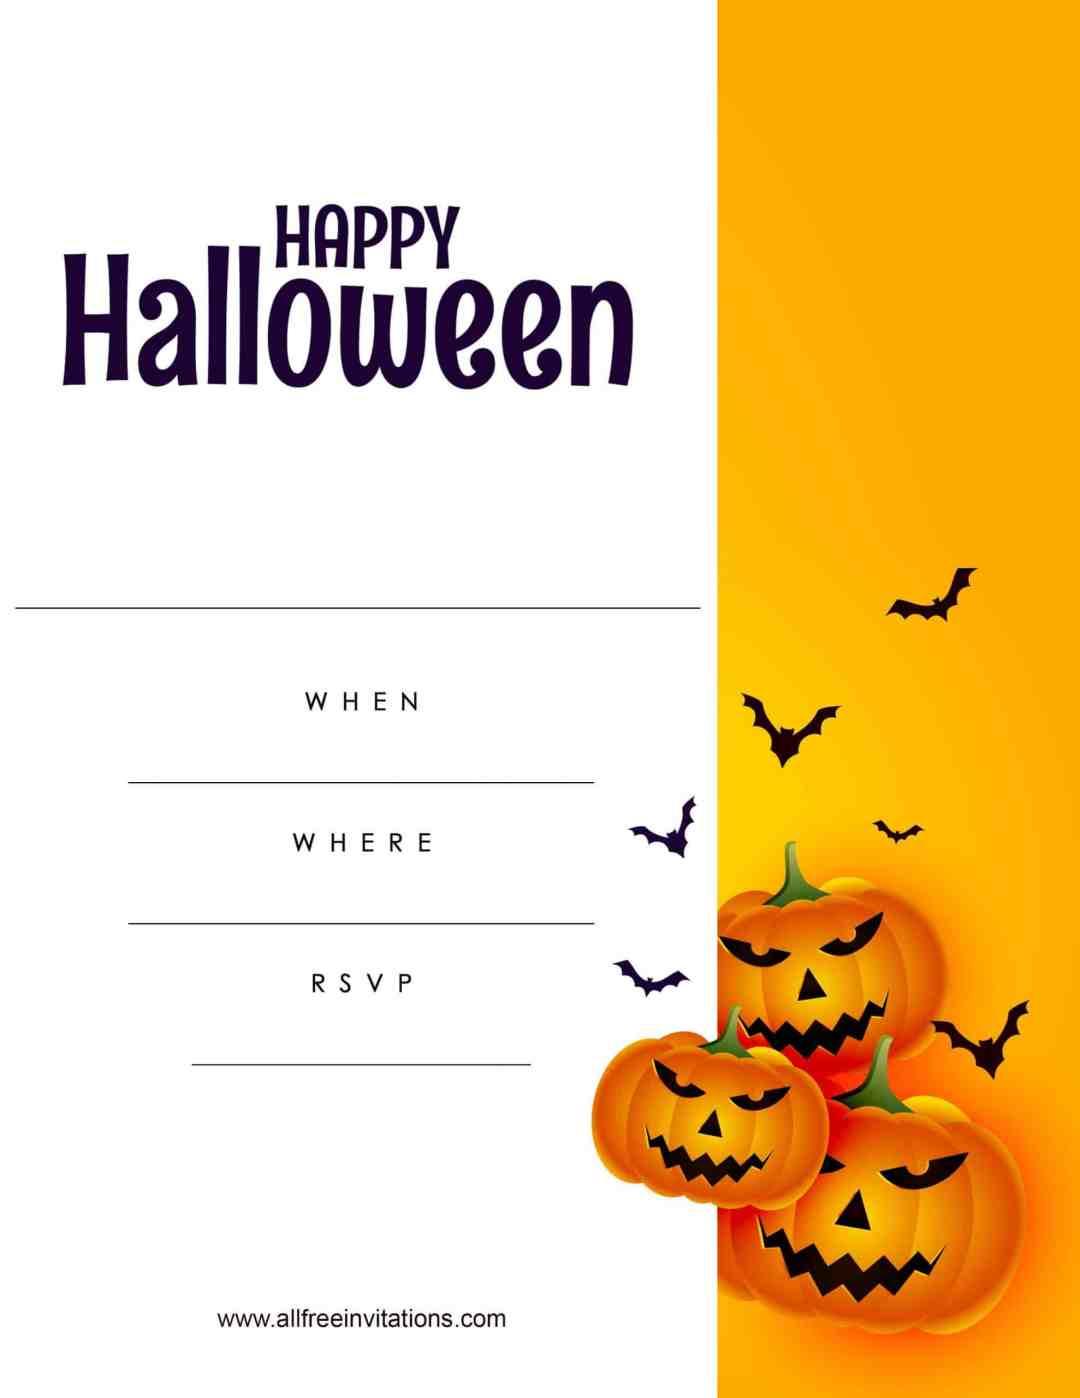 Free Halloween Invitation - All Free Invitations